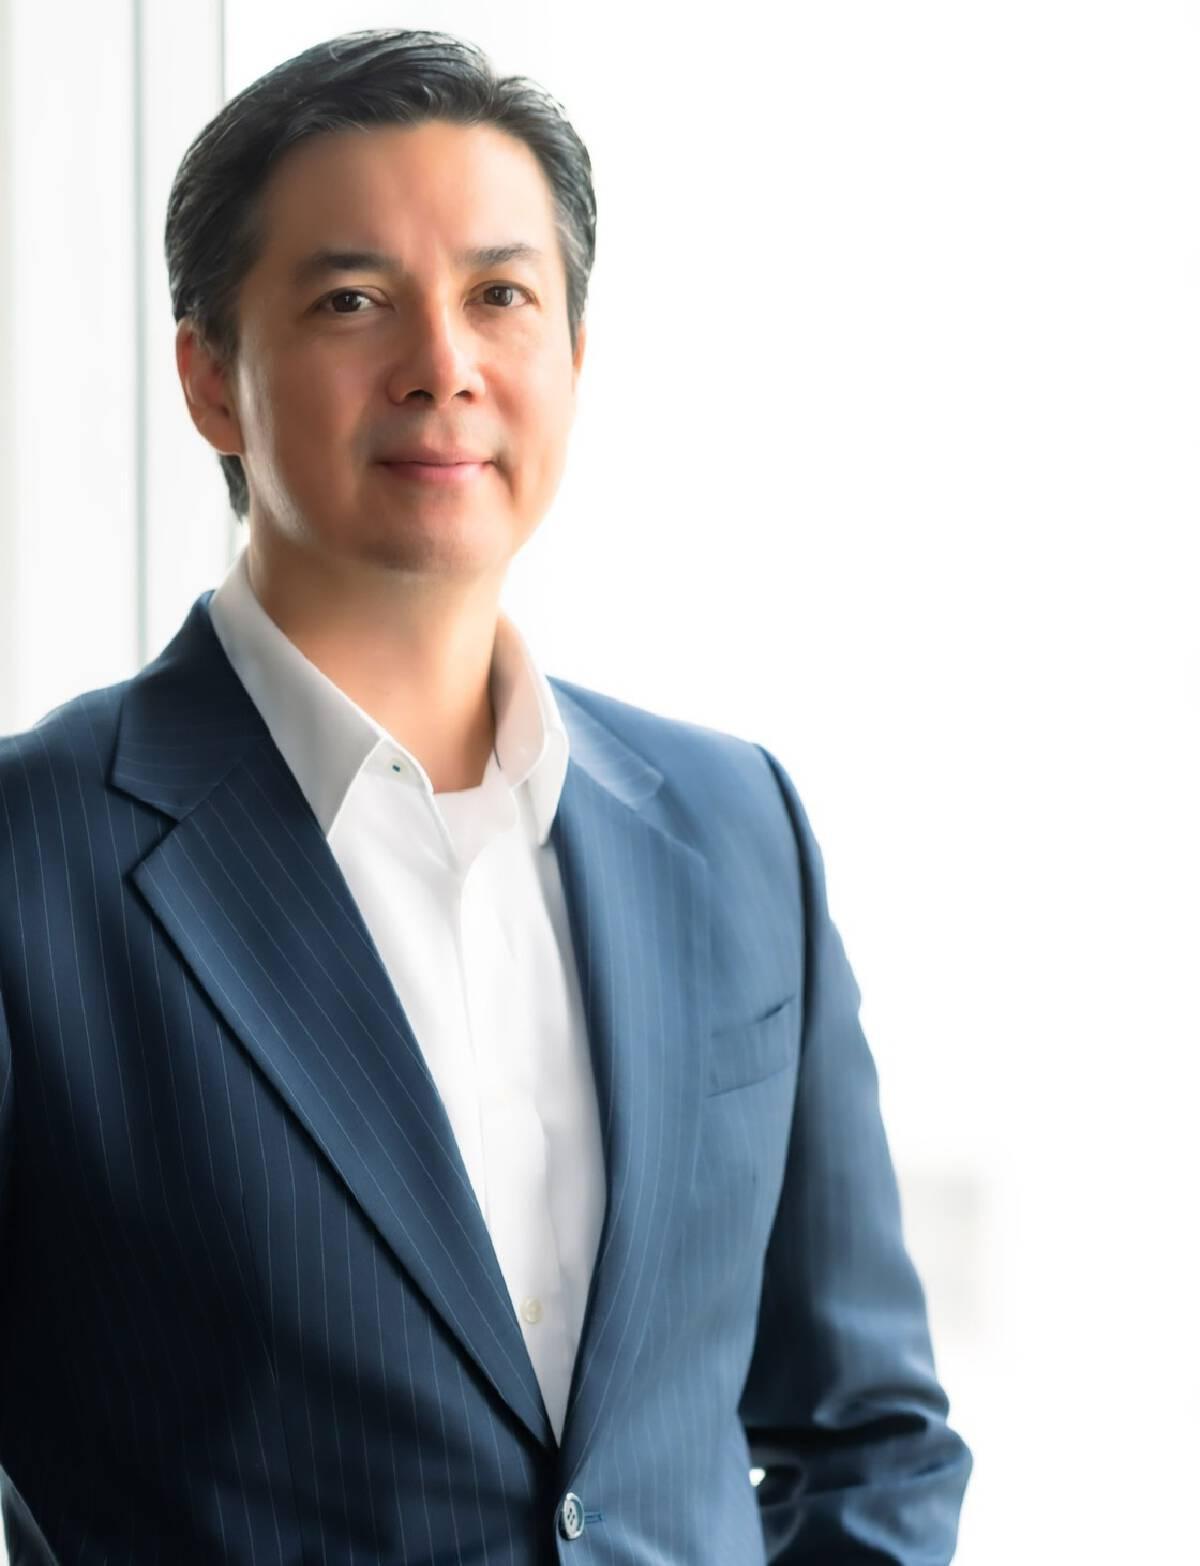 Maybank Kim Eng Thailand appoints Arapat Sangkharat as Chief Executive Officer